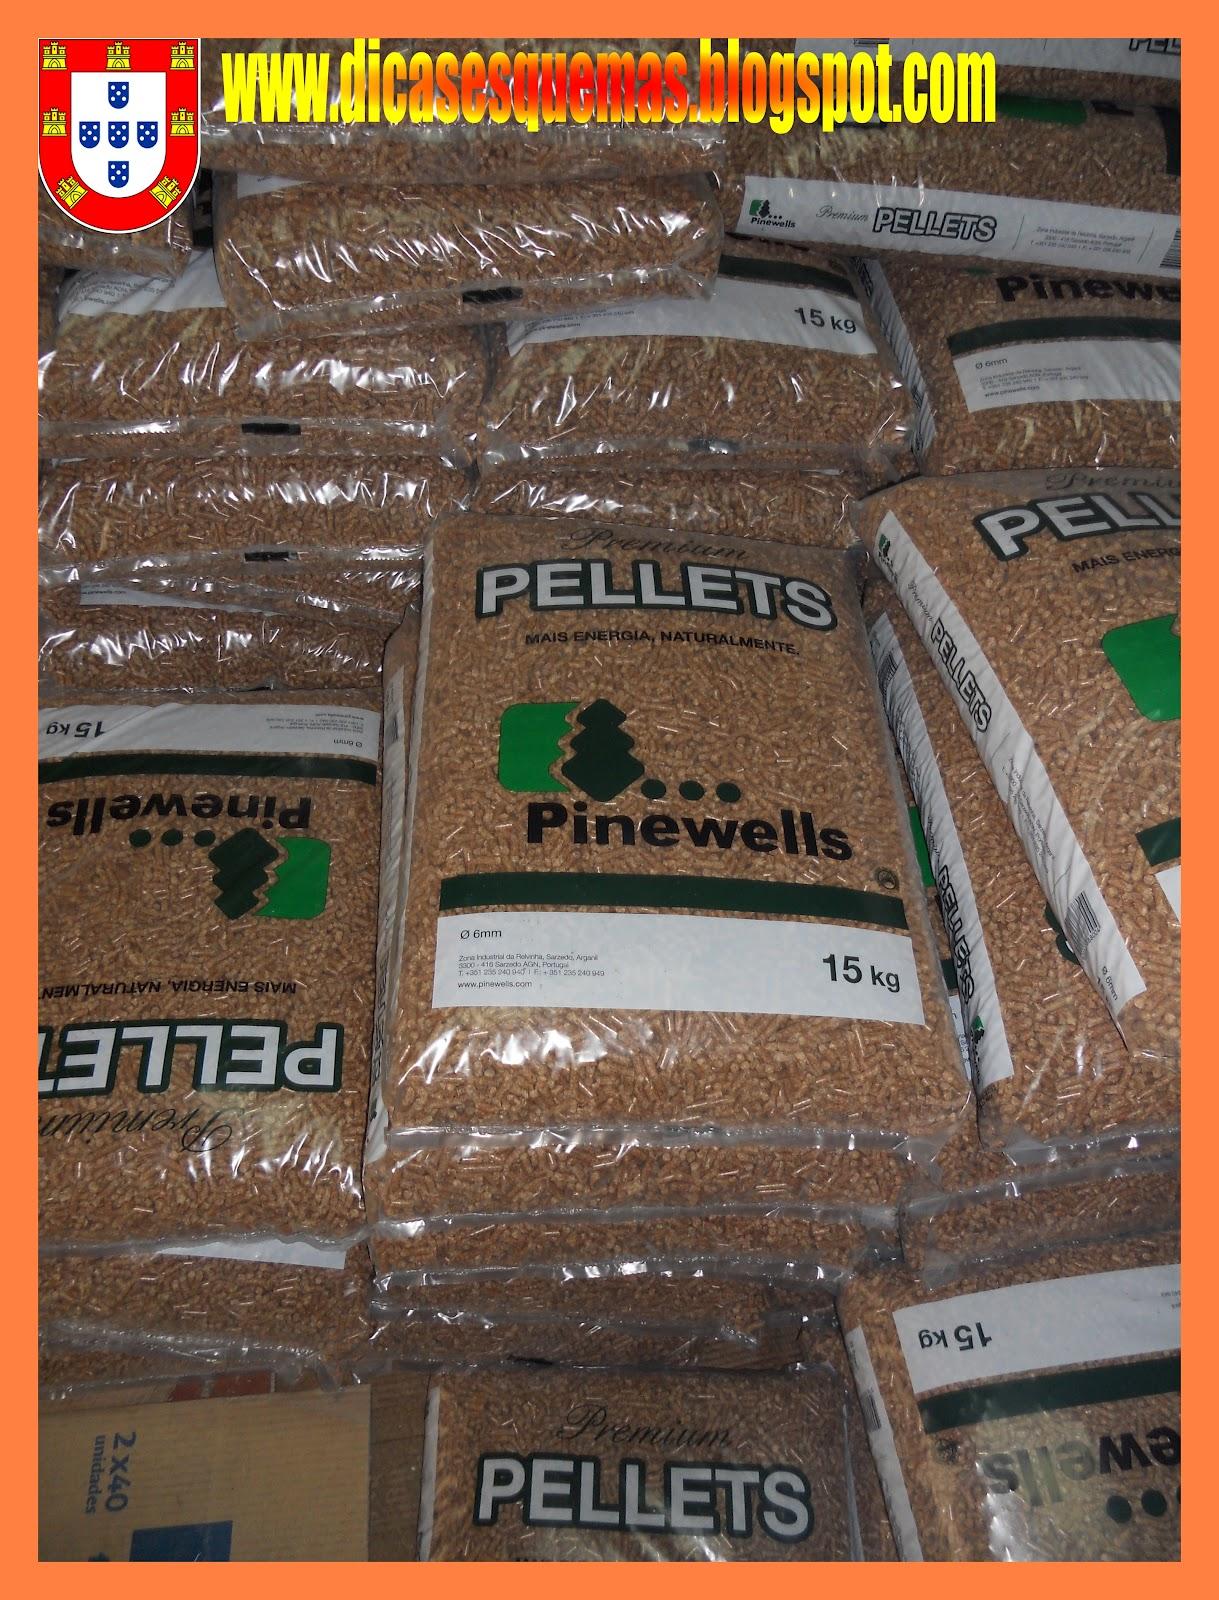 Pellets ser mesmo ecol gico este combust vel dicas - Sacos de pellets ...